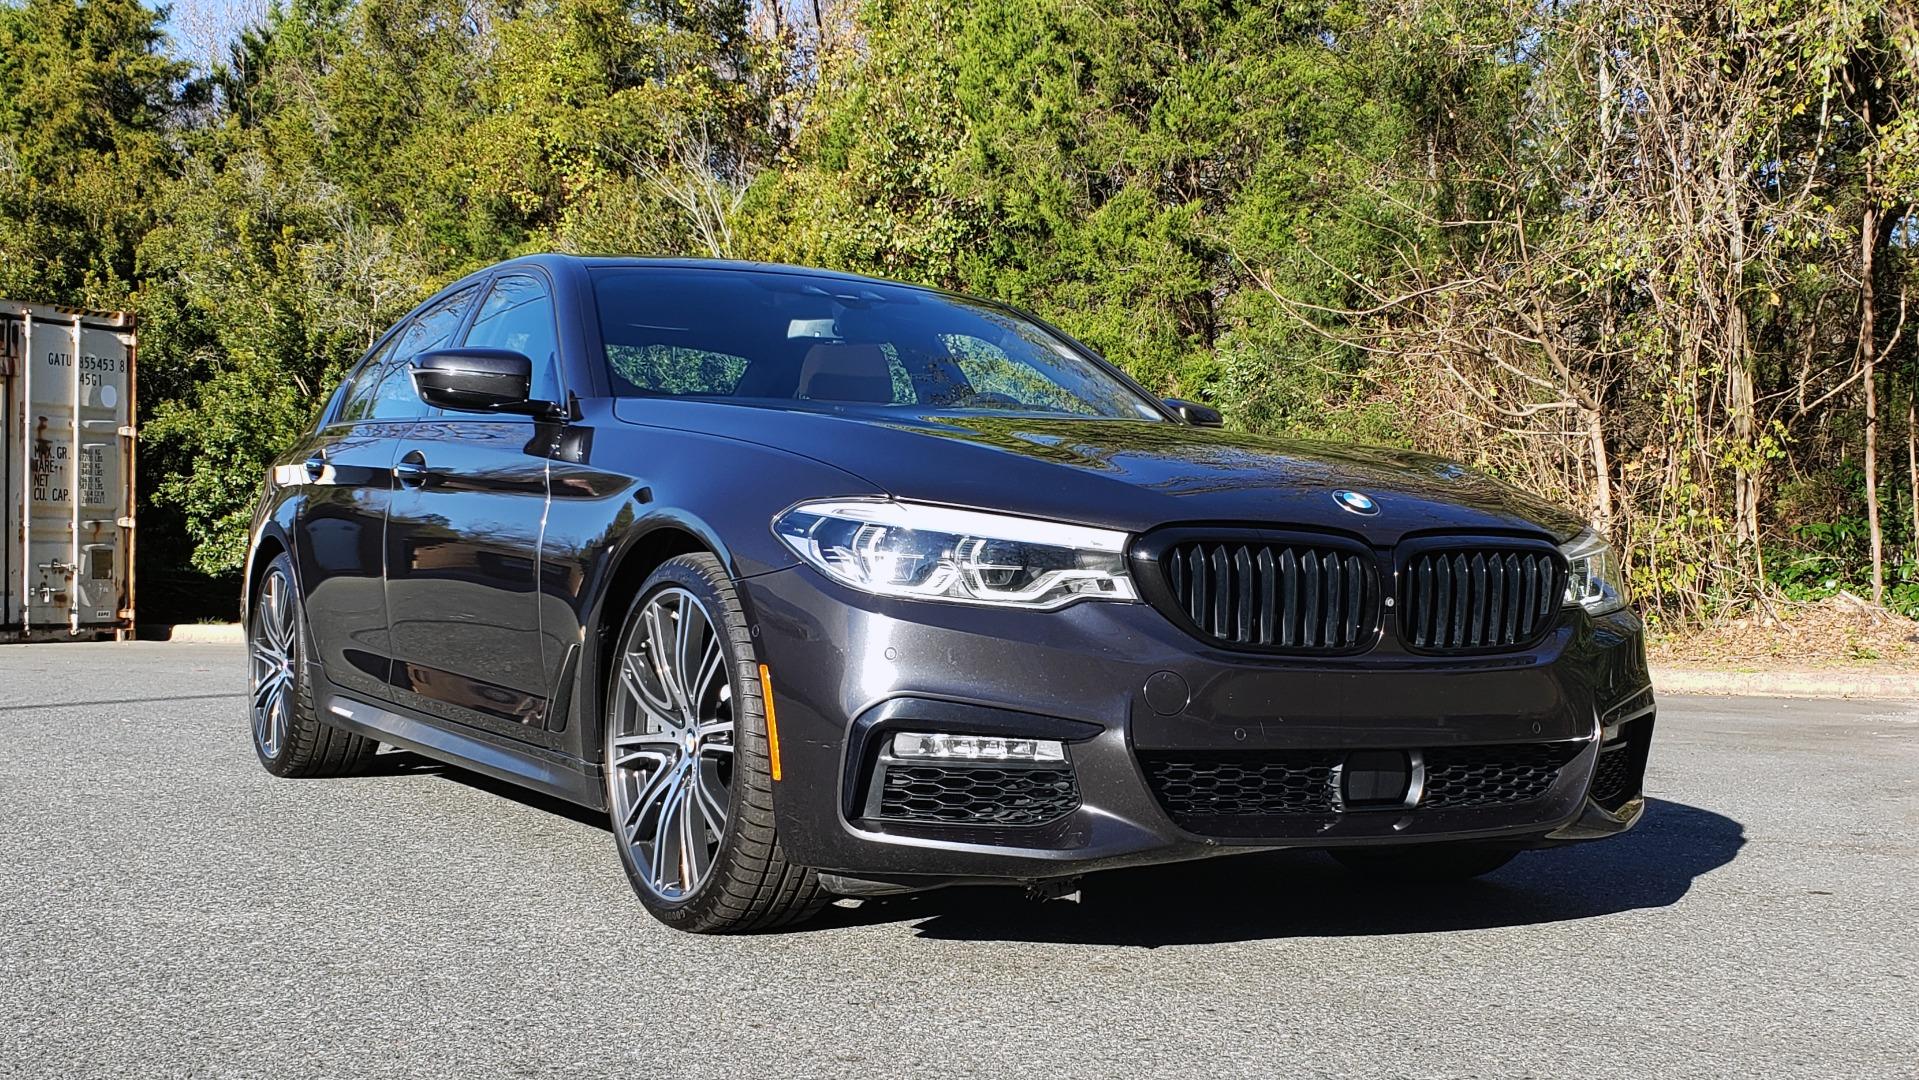 Used 2018 BMW 5 SERIES 540I M-SPORT / DRVR ASST / EXEC PKG / NAV / SUNROOF / HUD / REARVIEW for sale Sold at Formula Imports in Charlotte NC 28227 6